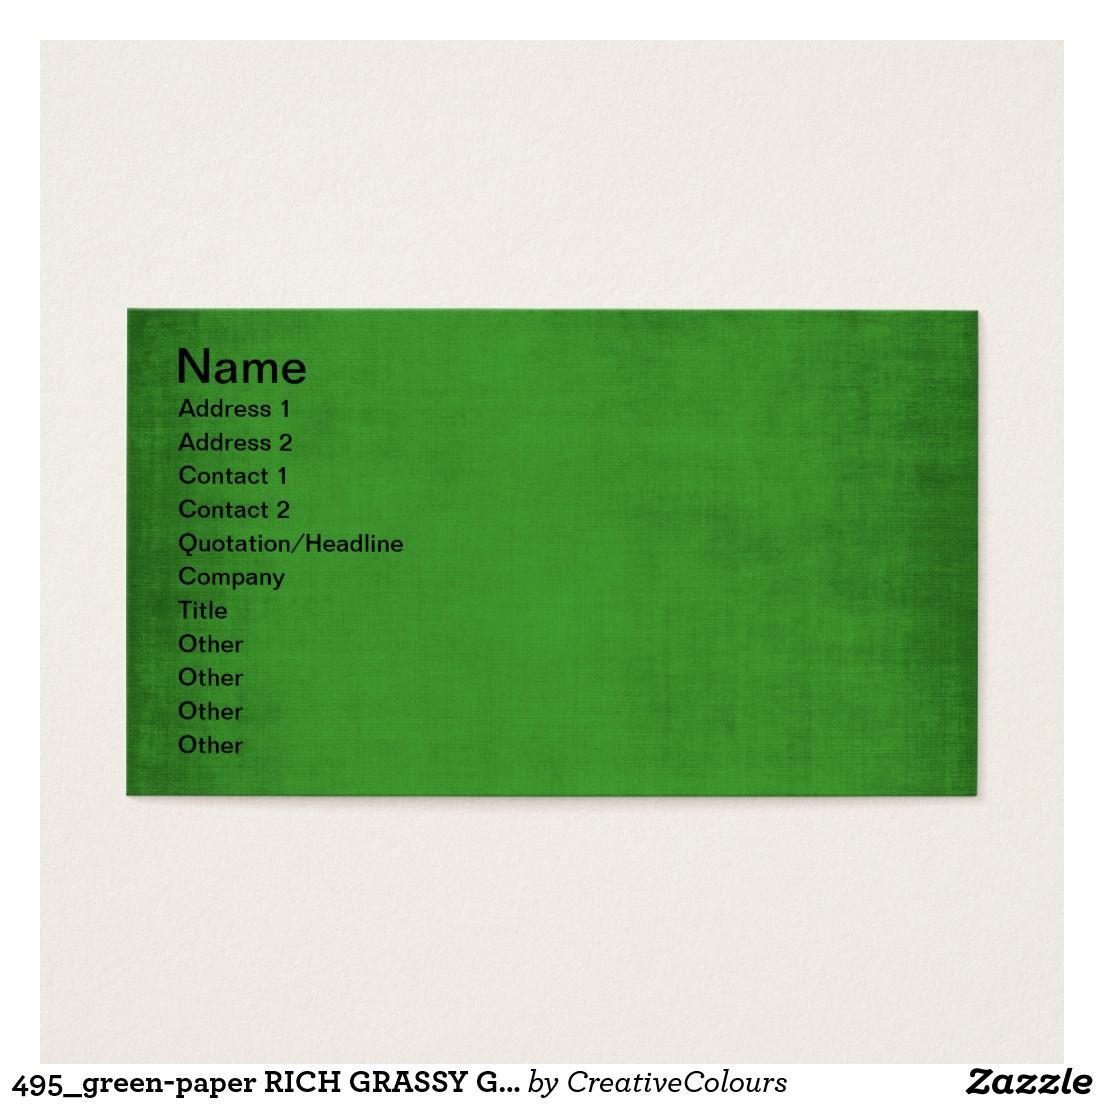 495 Green Paper RICH GRASSY GREEN TEMPLATE TEXTURE Business Card